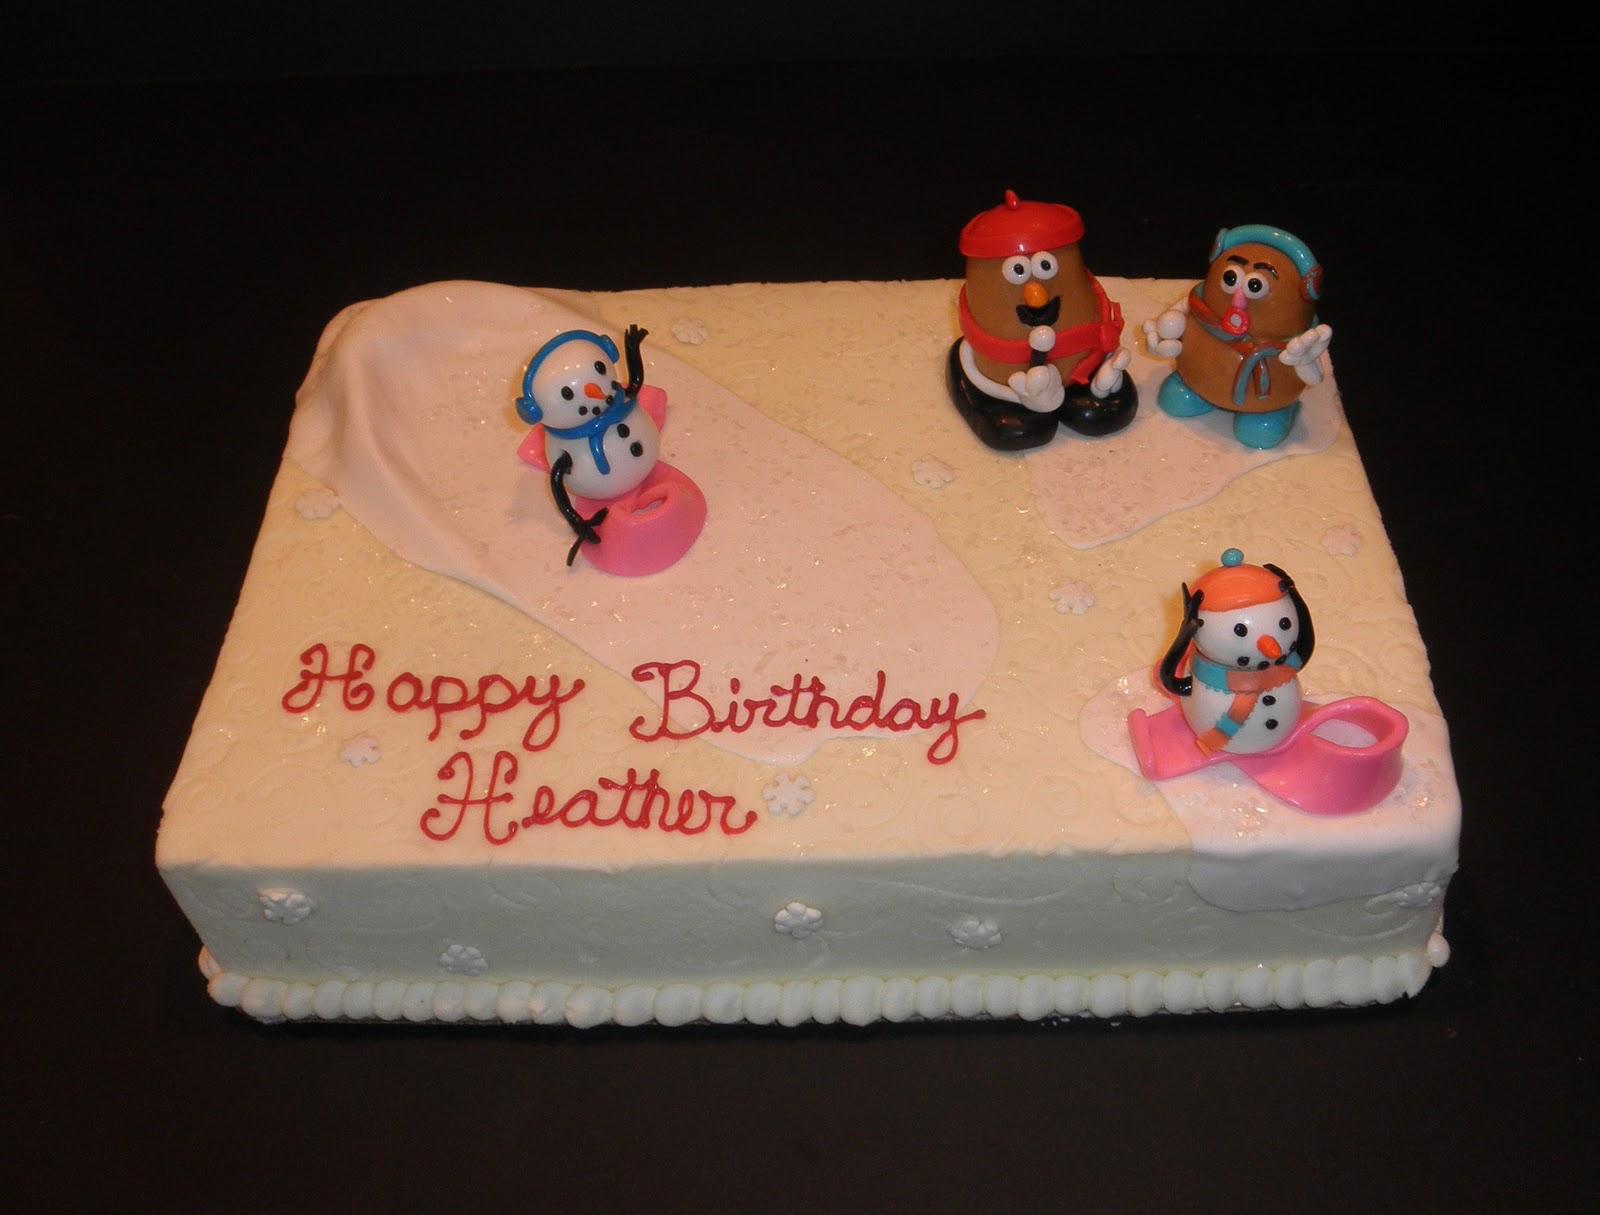 Sweet Ts Cake Design Mr Mrs Potato Head Birthday Cake